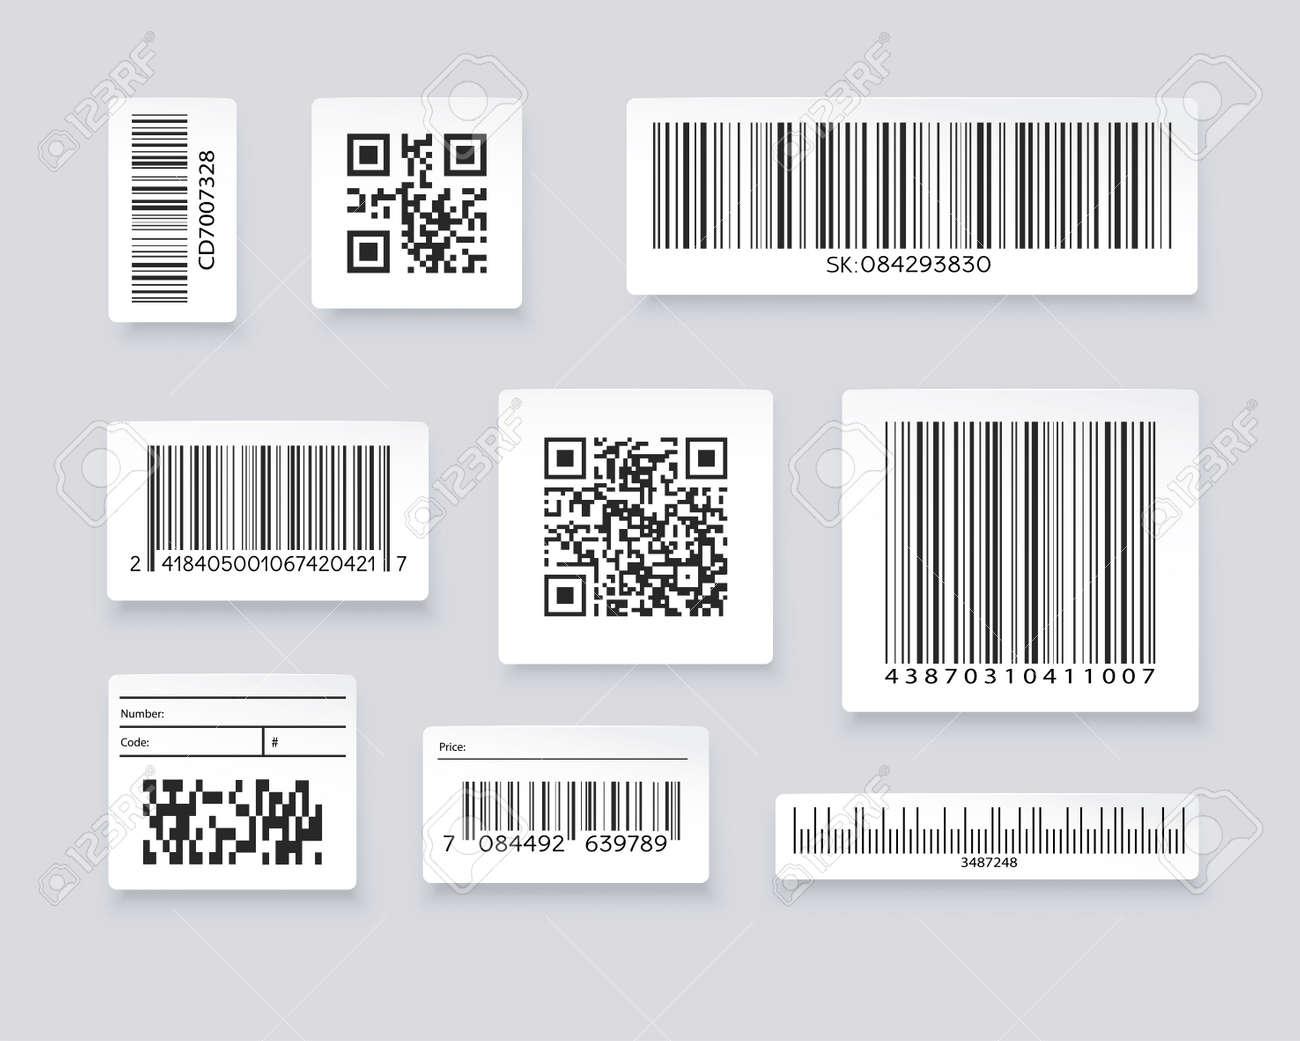 QR codes and barcode labels. Supermarket scan code bars, industrial barcode labels. Barcode label for scan, bar code sticker, vector illustration - 152478150